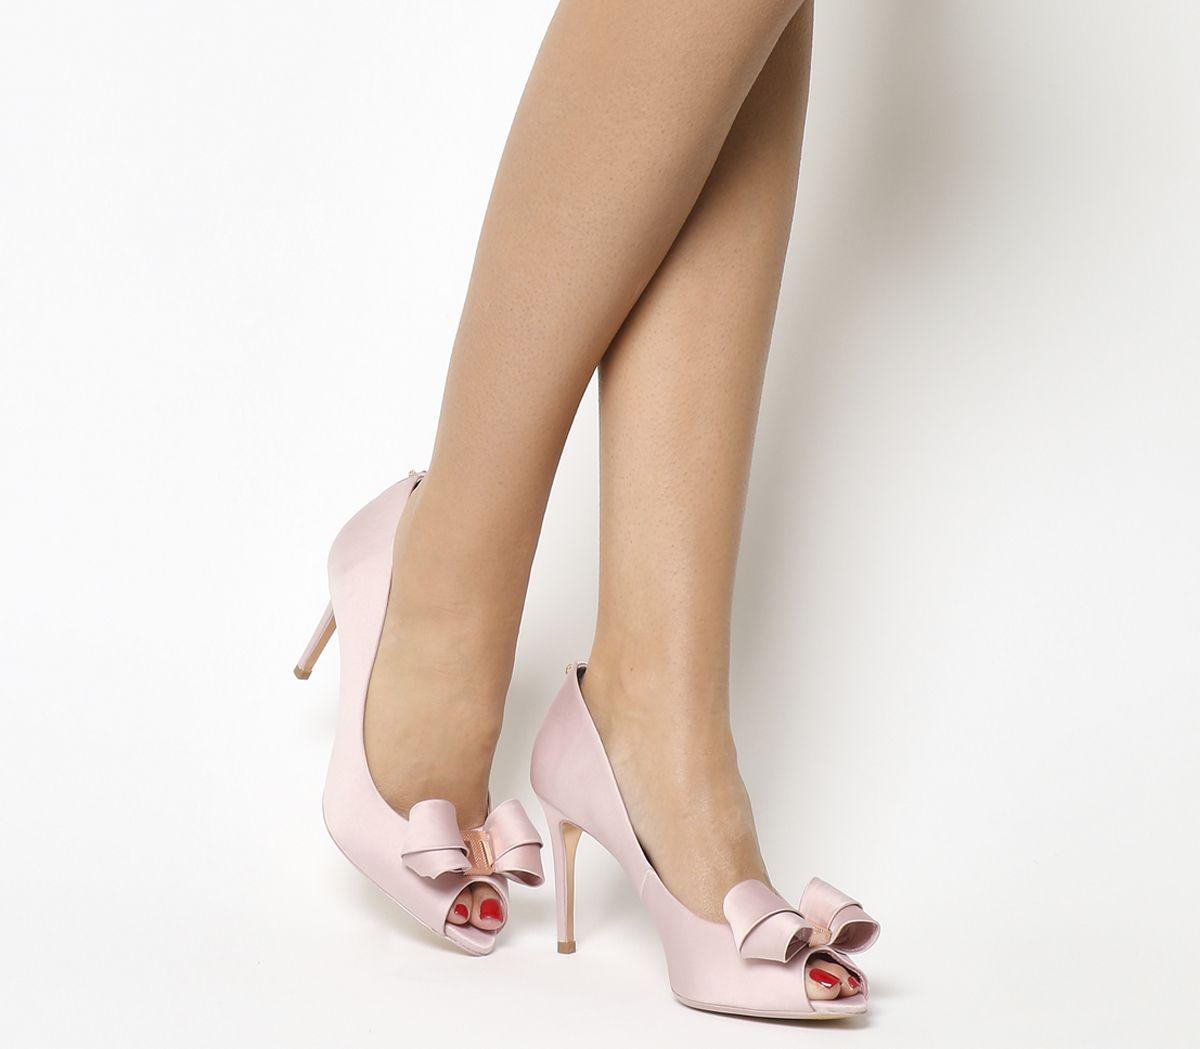 ea128c055214 Ted Baker Vylett Peep Toe Heels Light Pink - High Heels